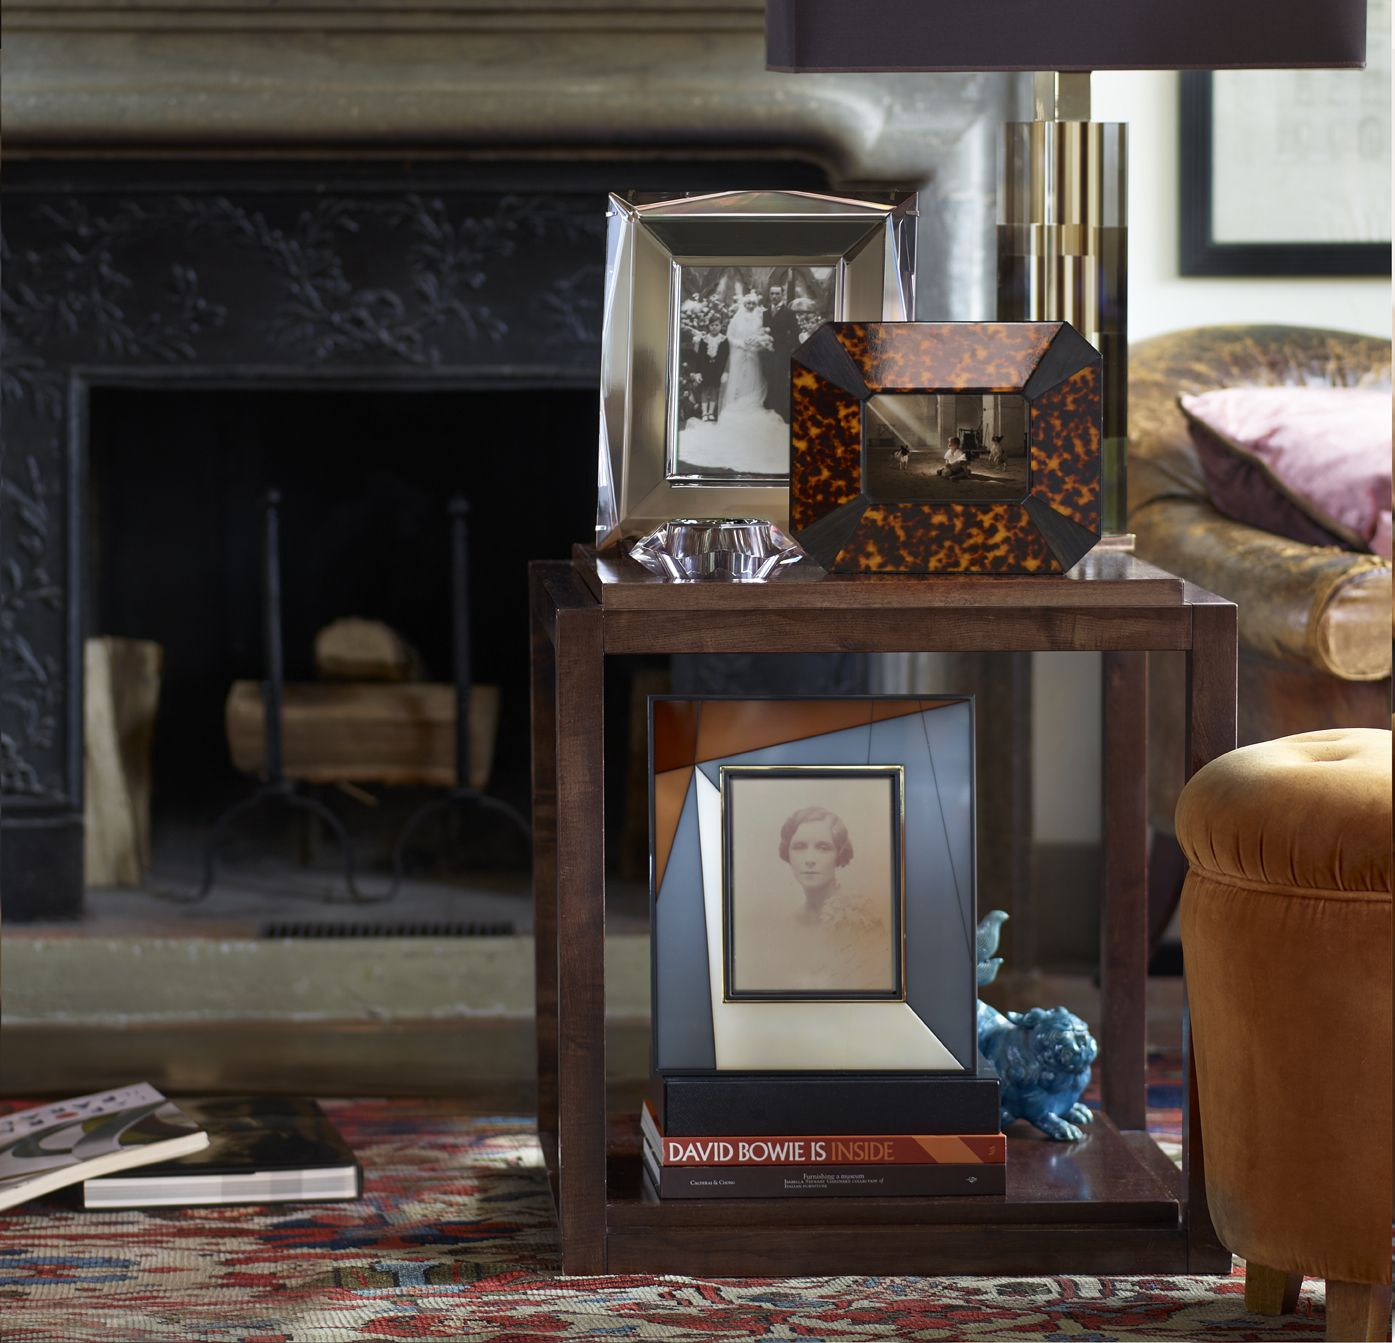 Silia Memories #Silia #home #lamp #frame #videpoche #lucite #luxury #design #madeinitaly